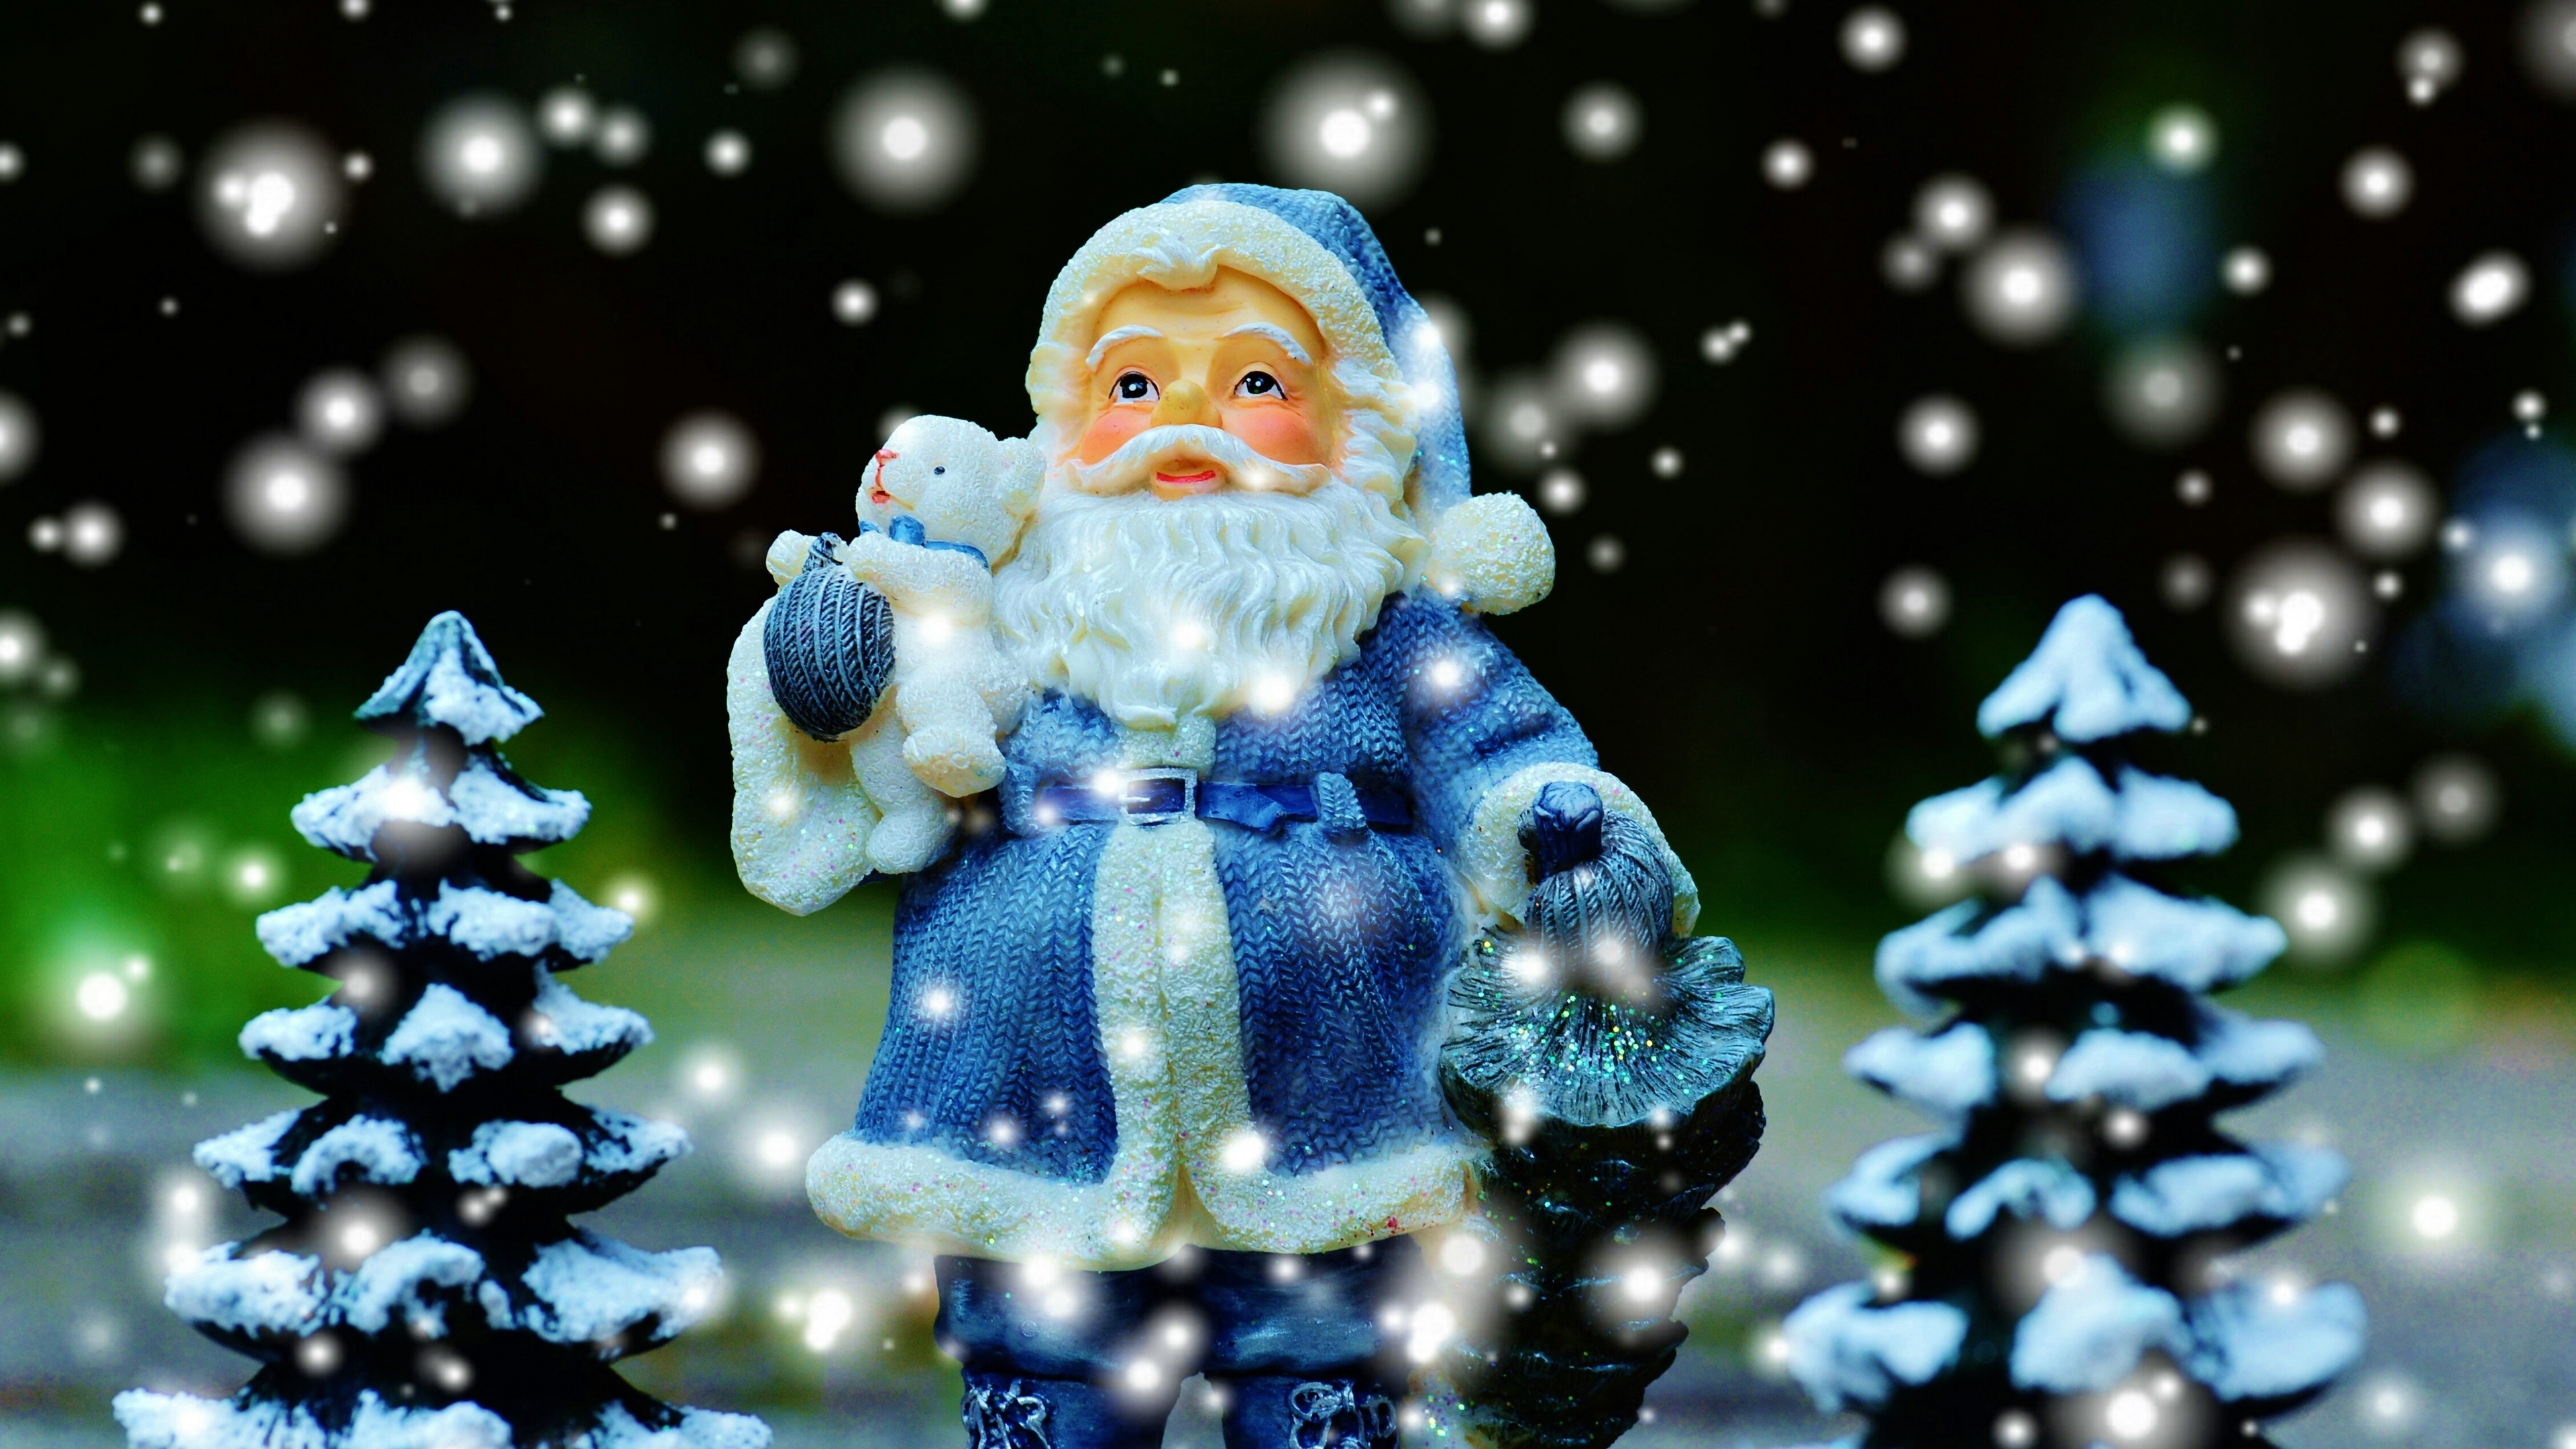 santa claus christmas trees new year christmas 4k 1538344809 - santa claus, christmas trees, new year, christmas 4k - santa claus, new year, christmas trees